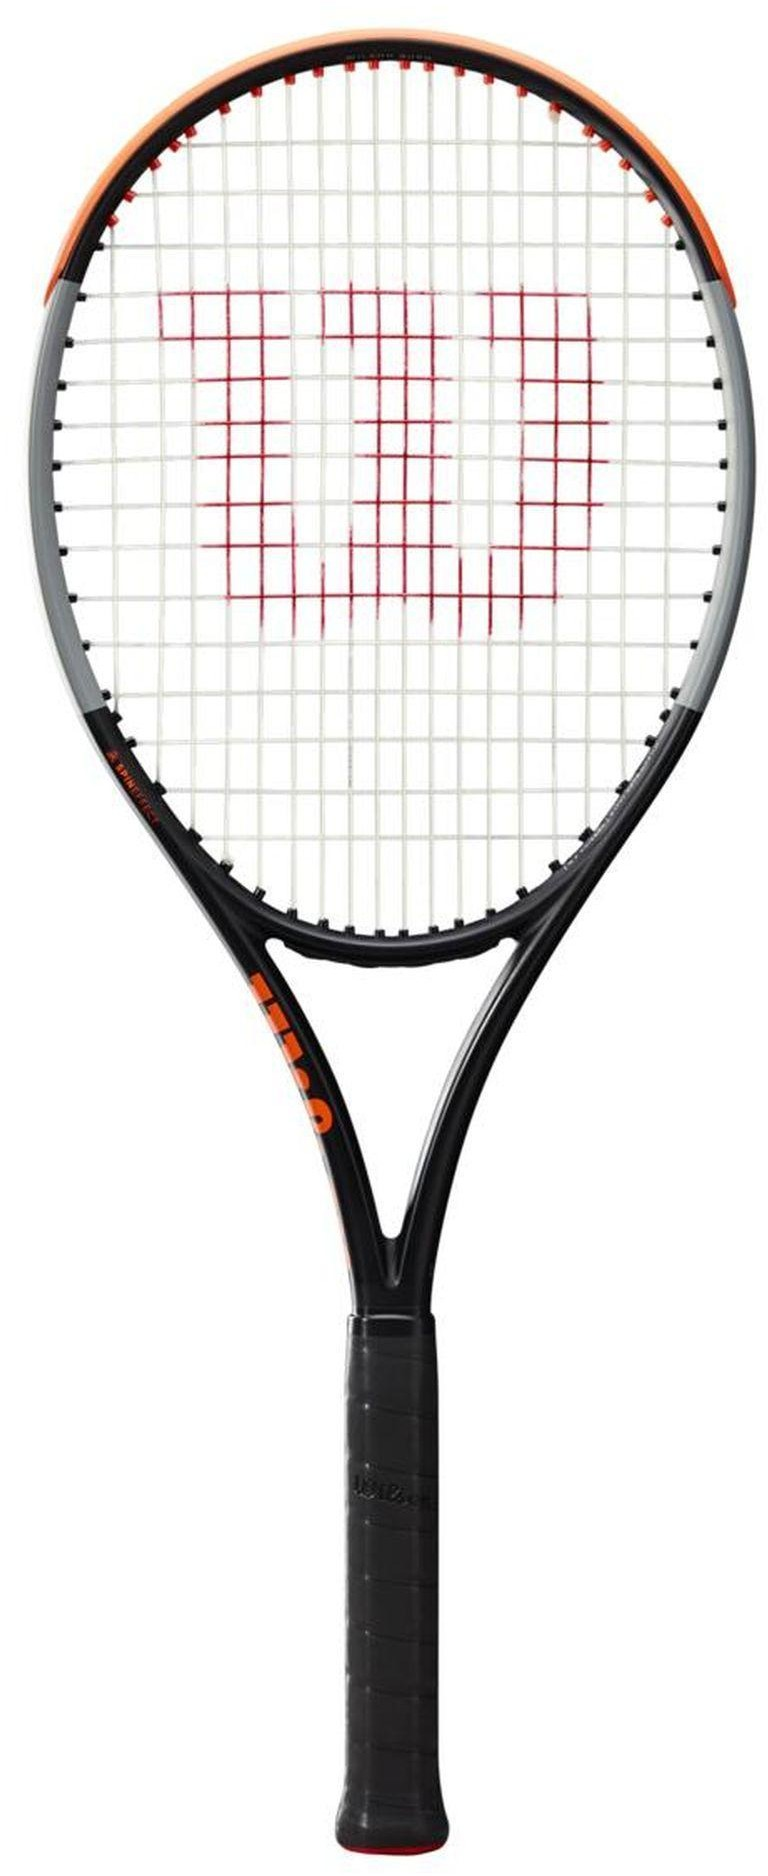 Wilson Rakieta tenisowa BURN 100LS V4.0 unisex